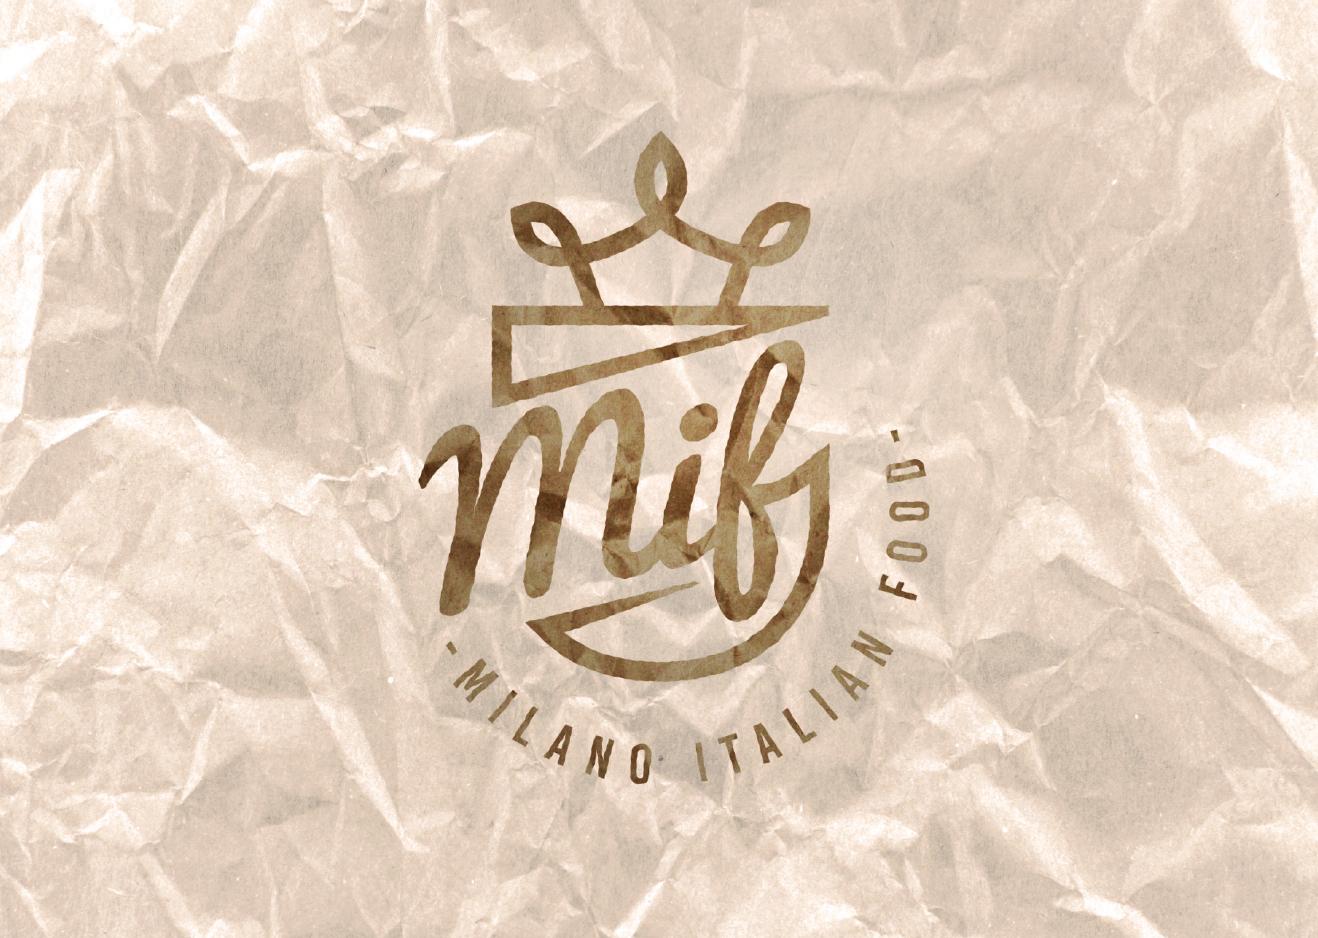 Mif_001